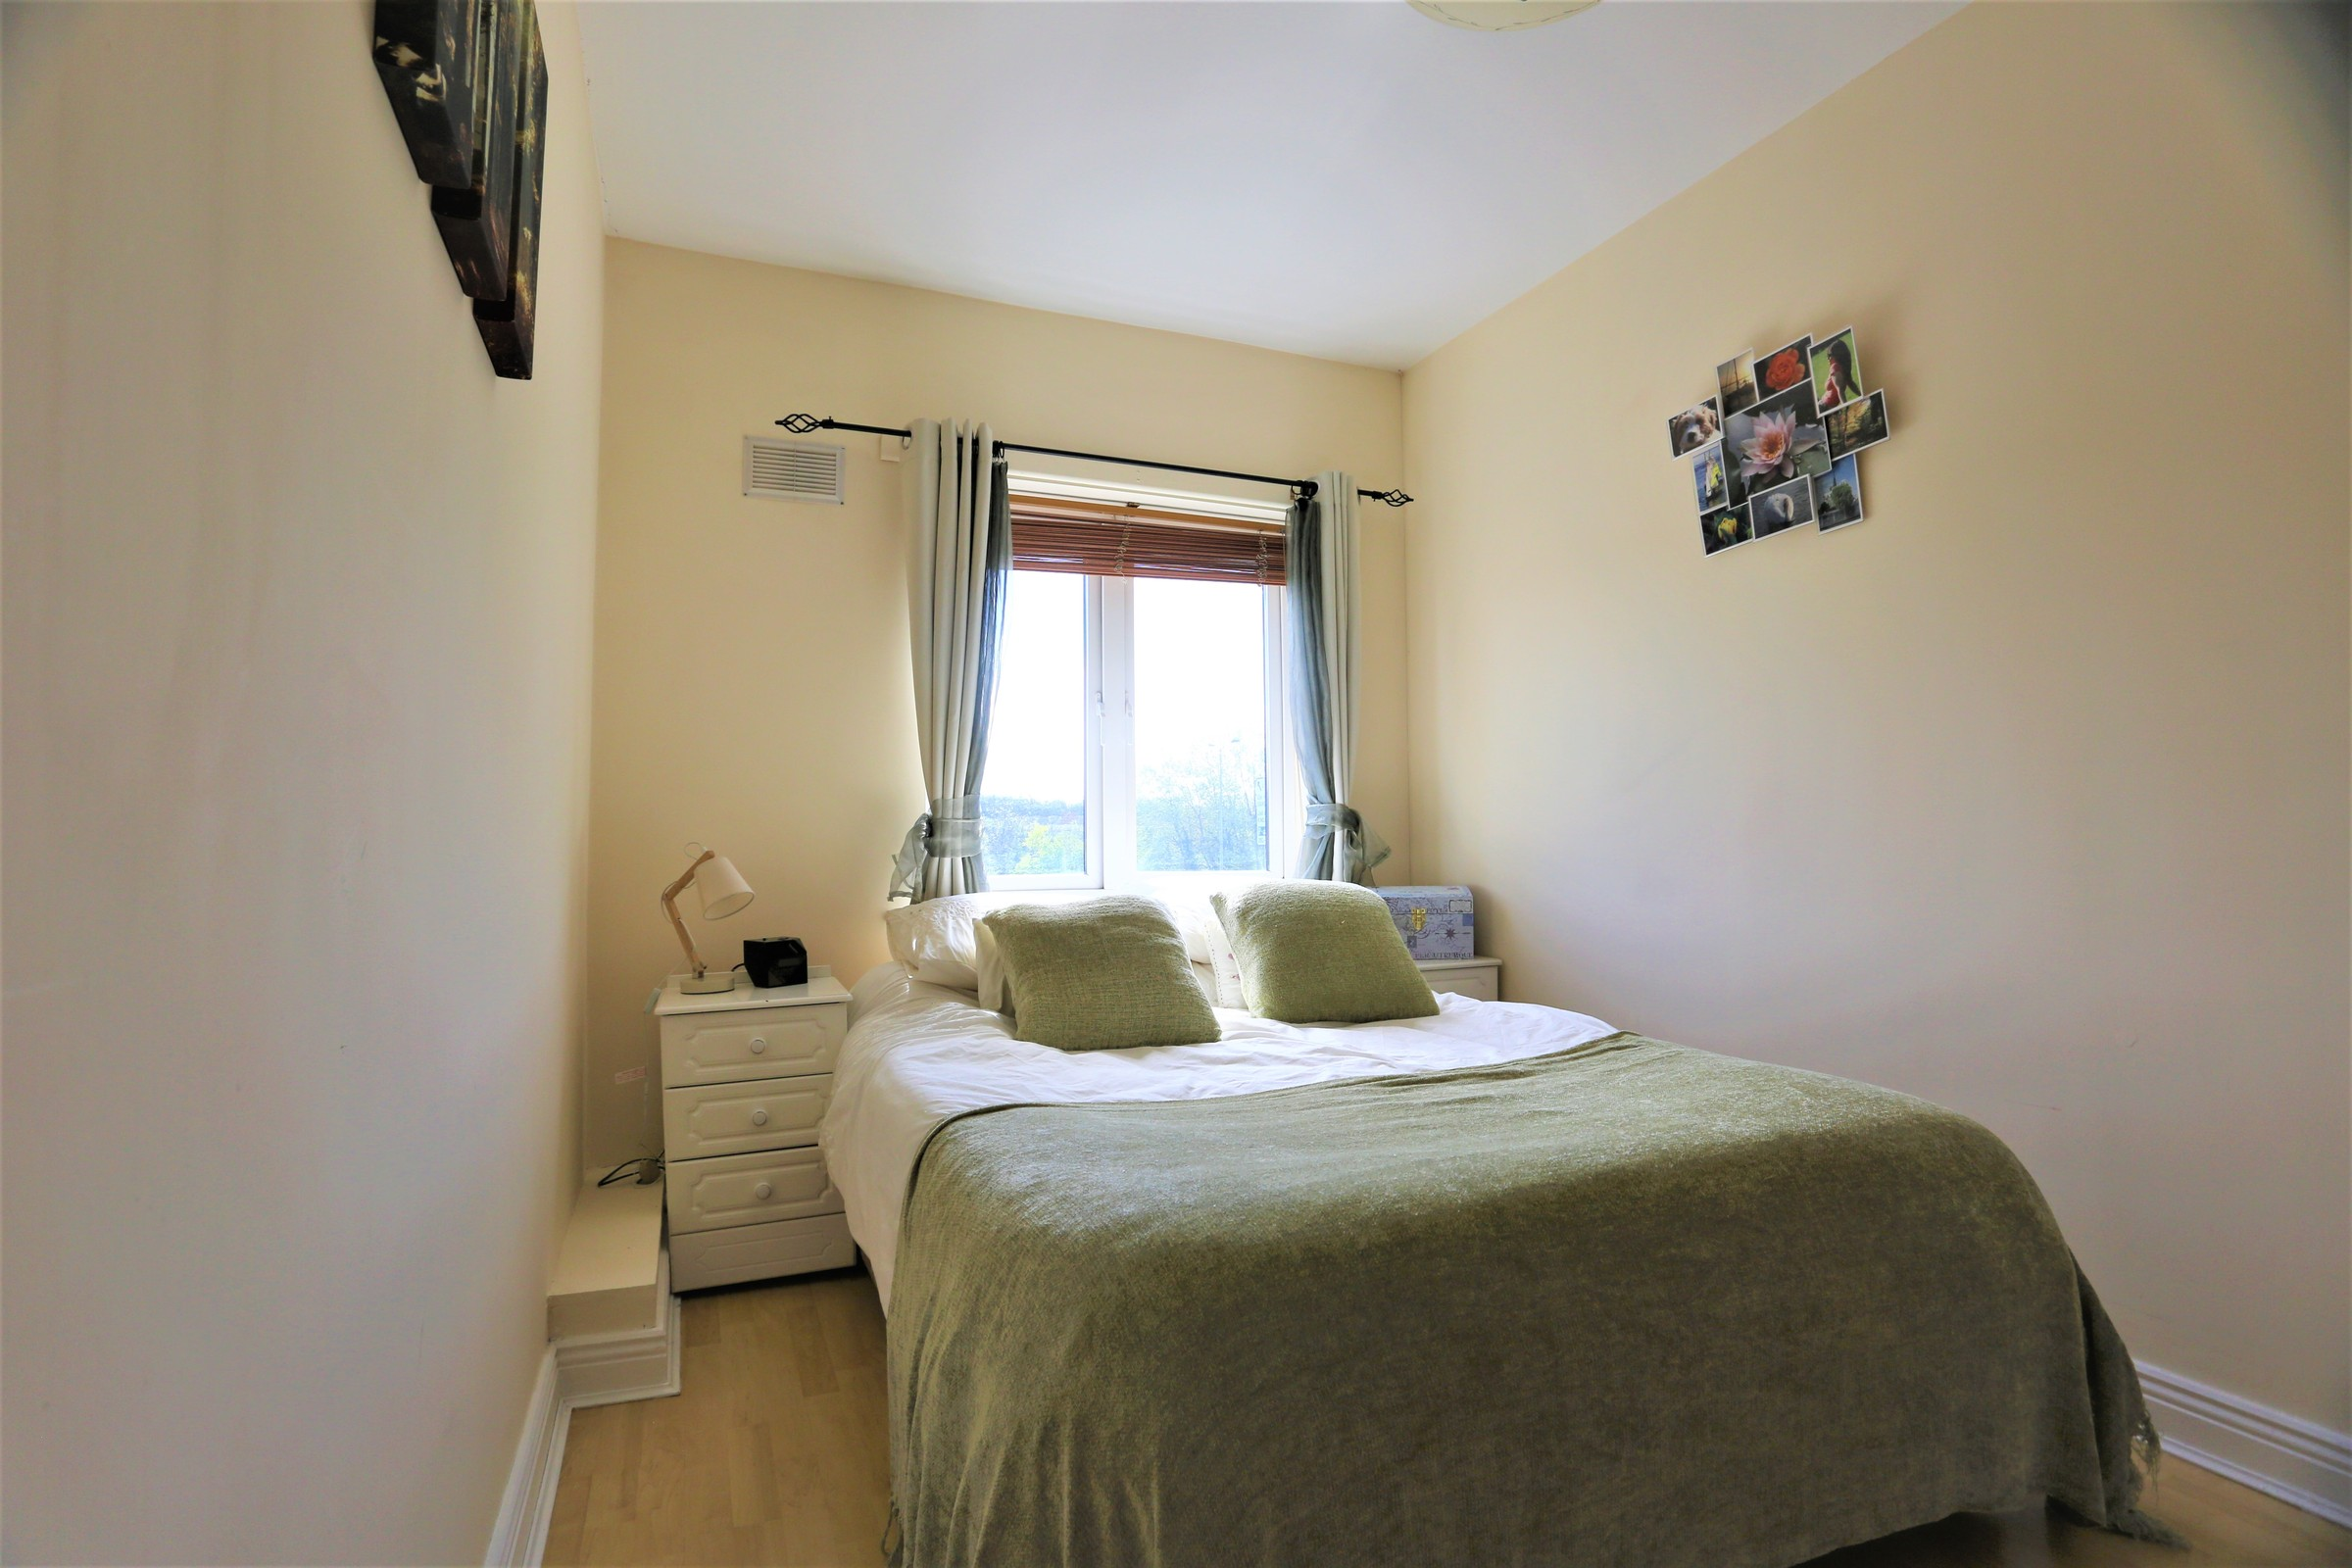 13 Newlands Manor Fairways, Clondalkin, Dublin 22